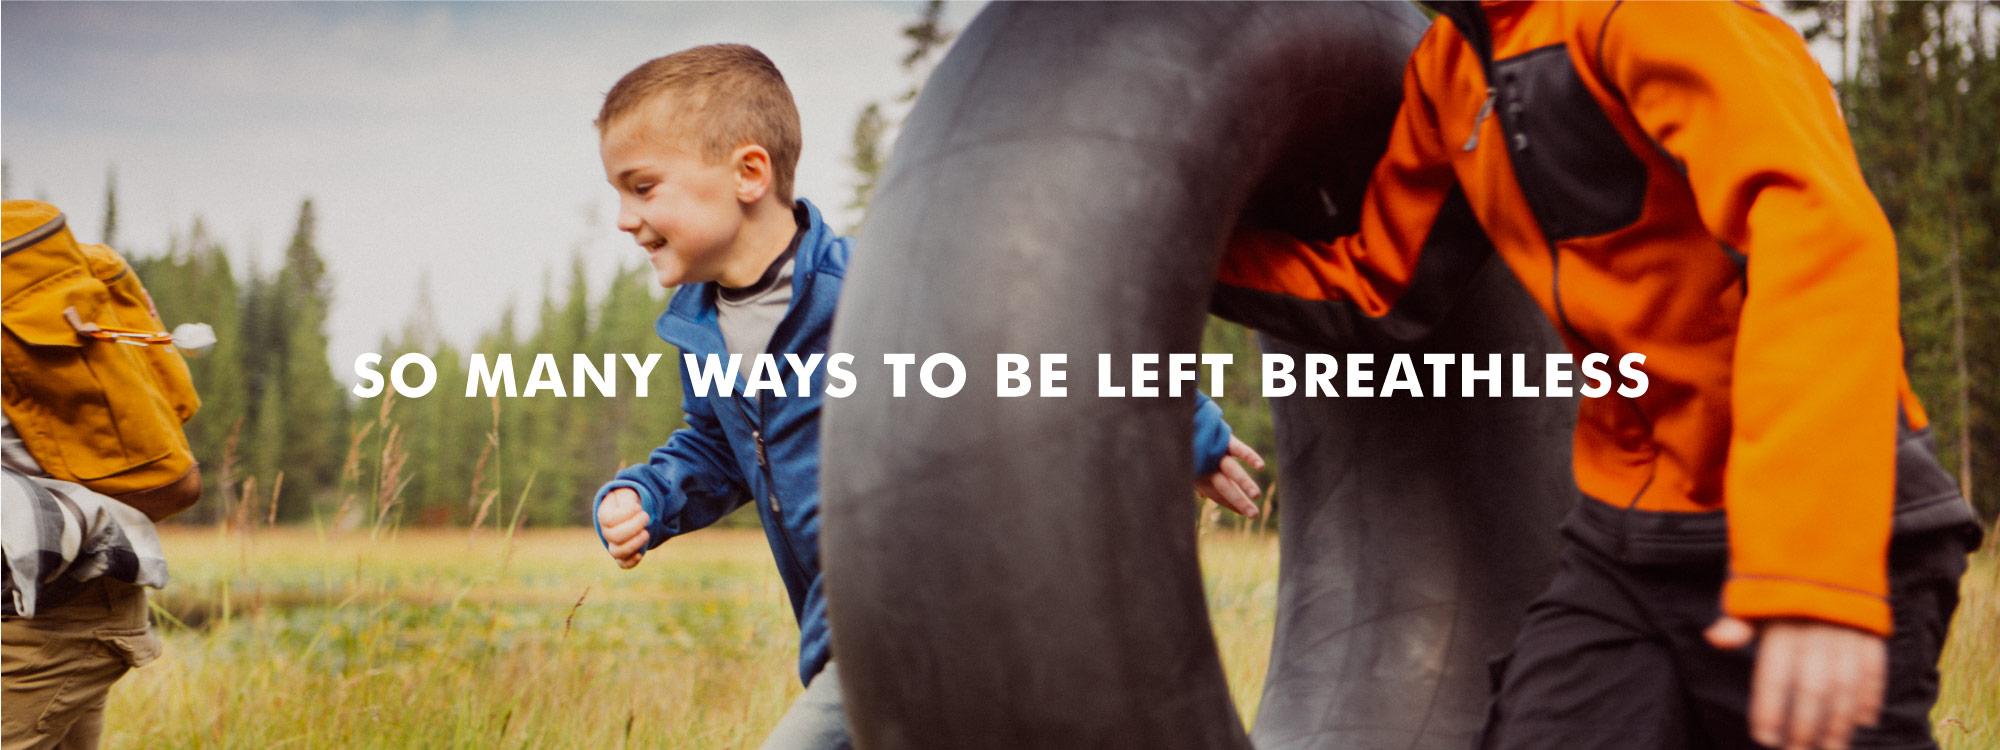 So Many Ways To Be Left Breathless